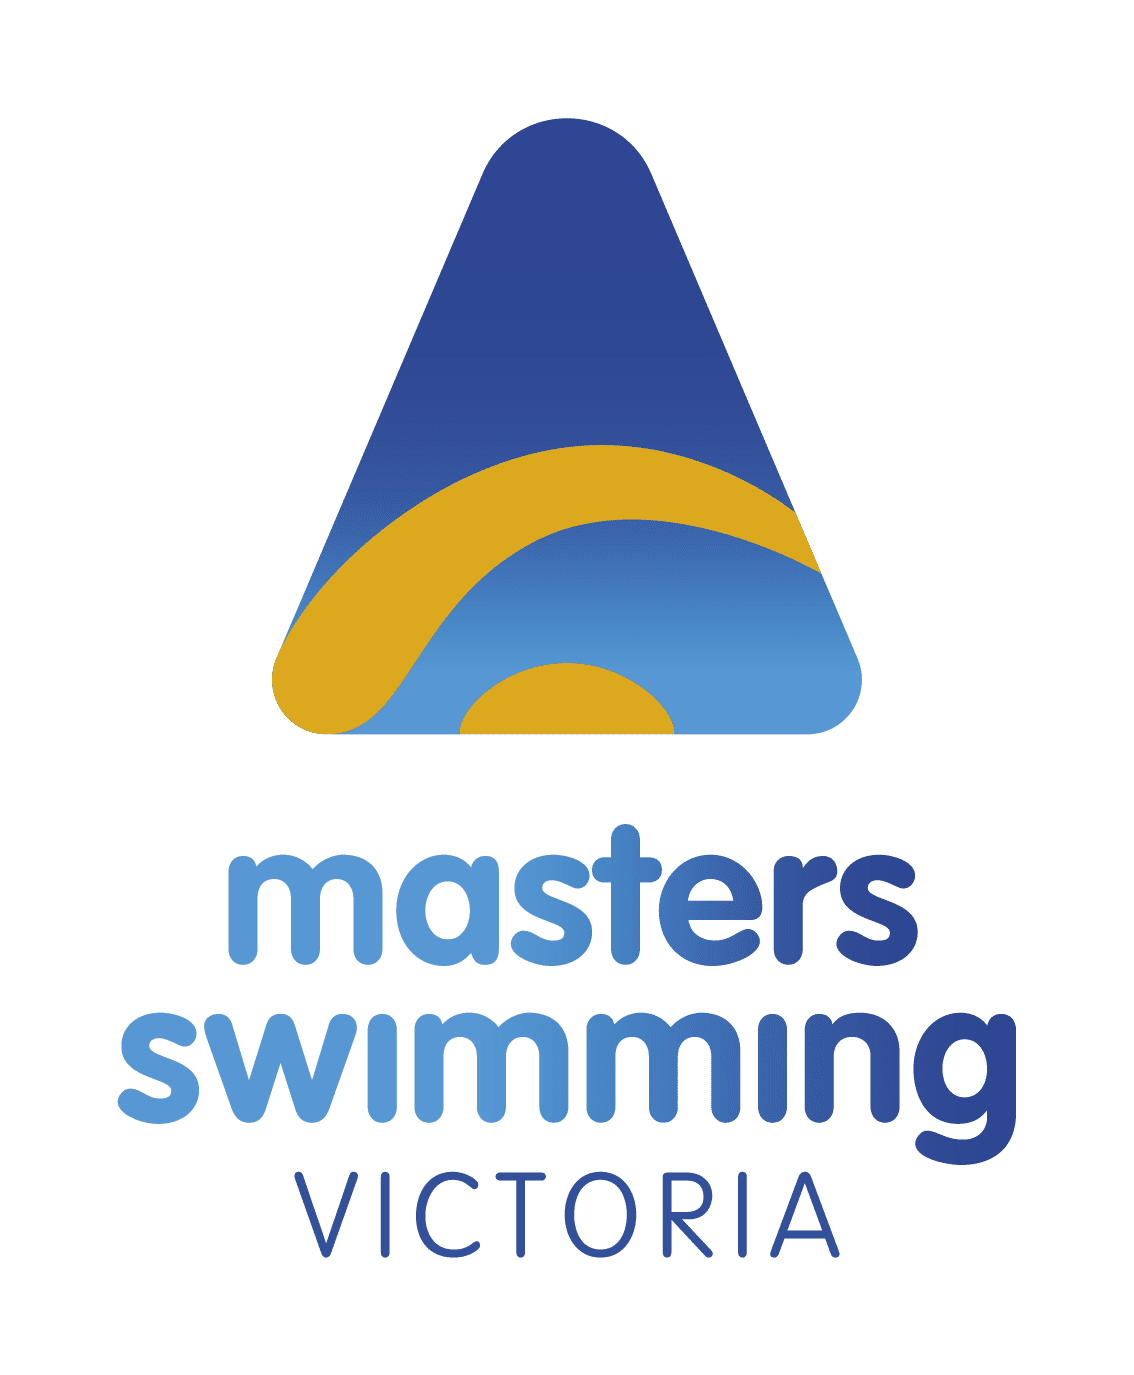 Masters Swimming VIC